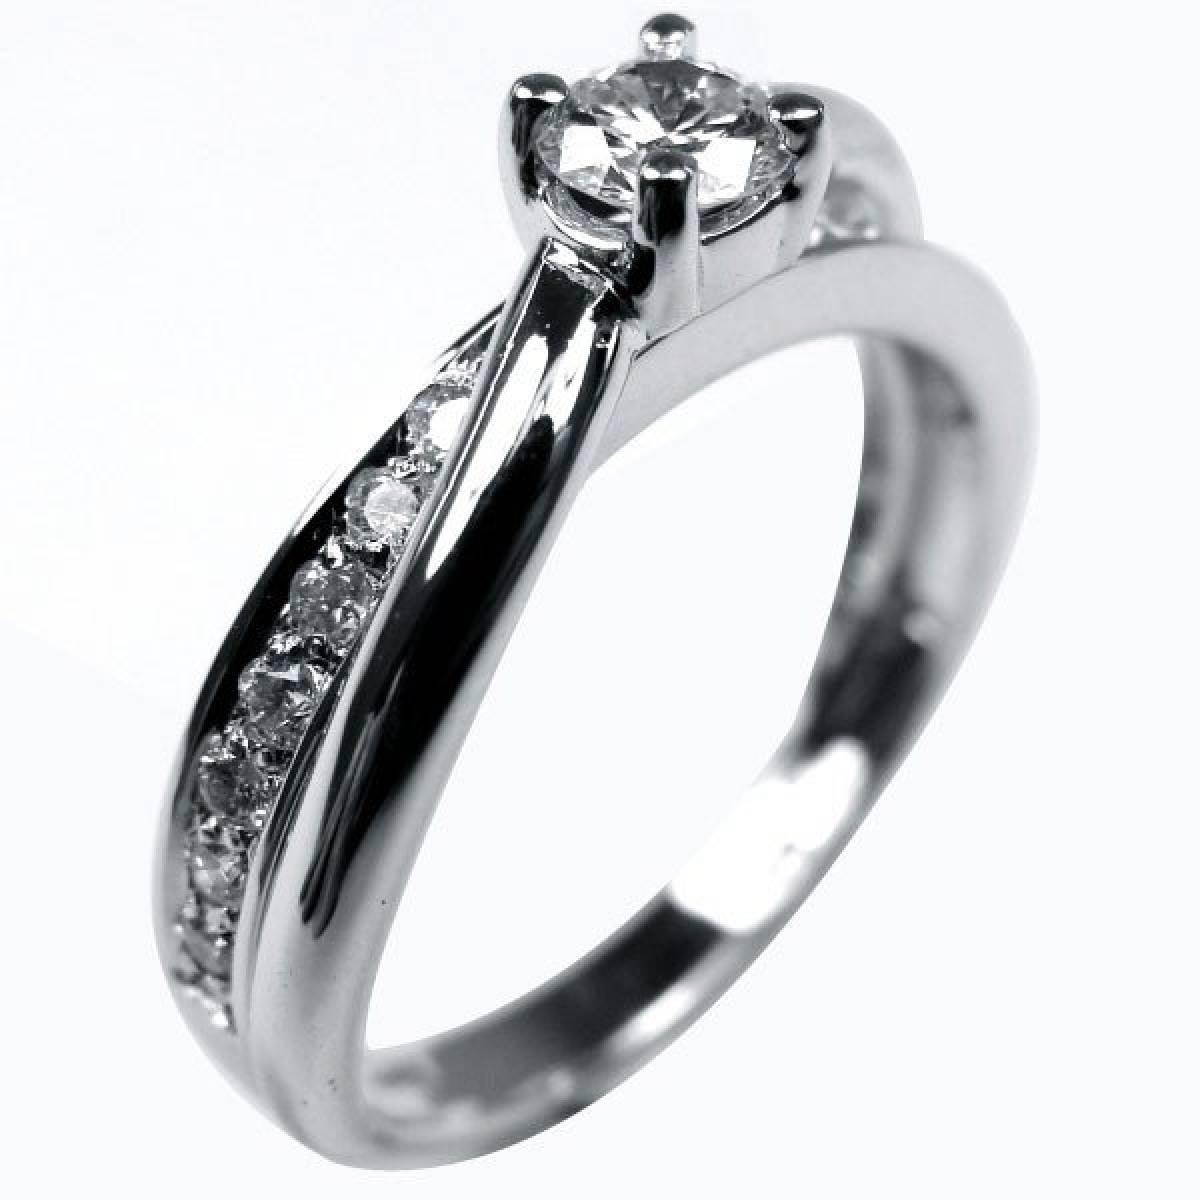 Anel de Noivado, ouro de 19 kts, 14 diamantes de 0,28 cts e 1 de 0,25 cts